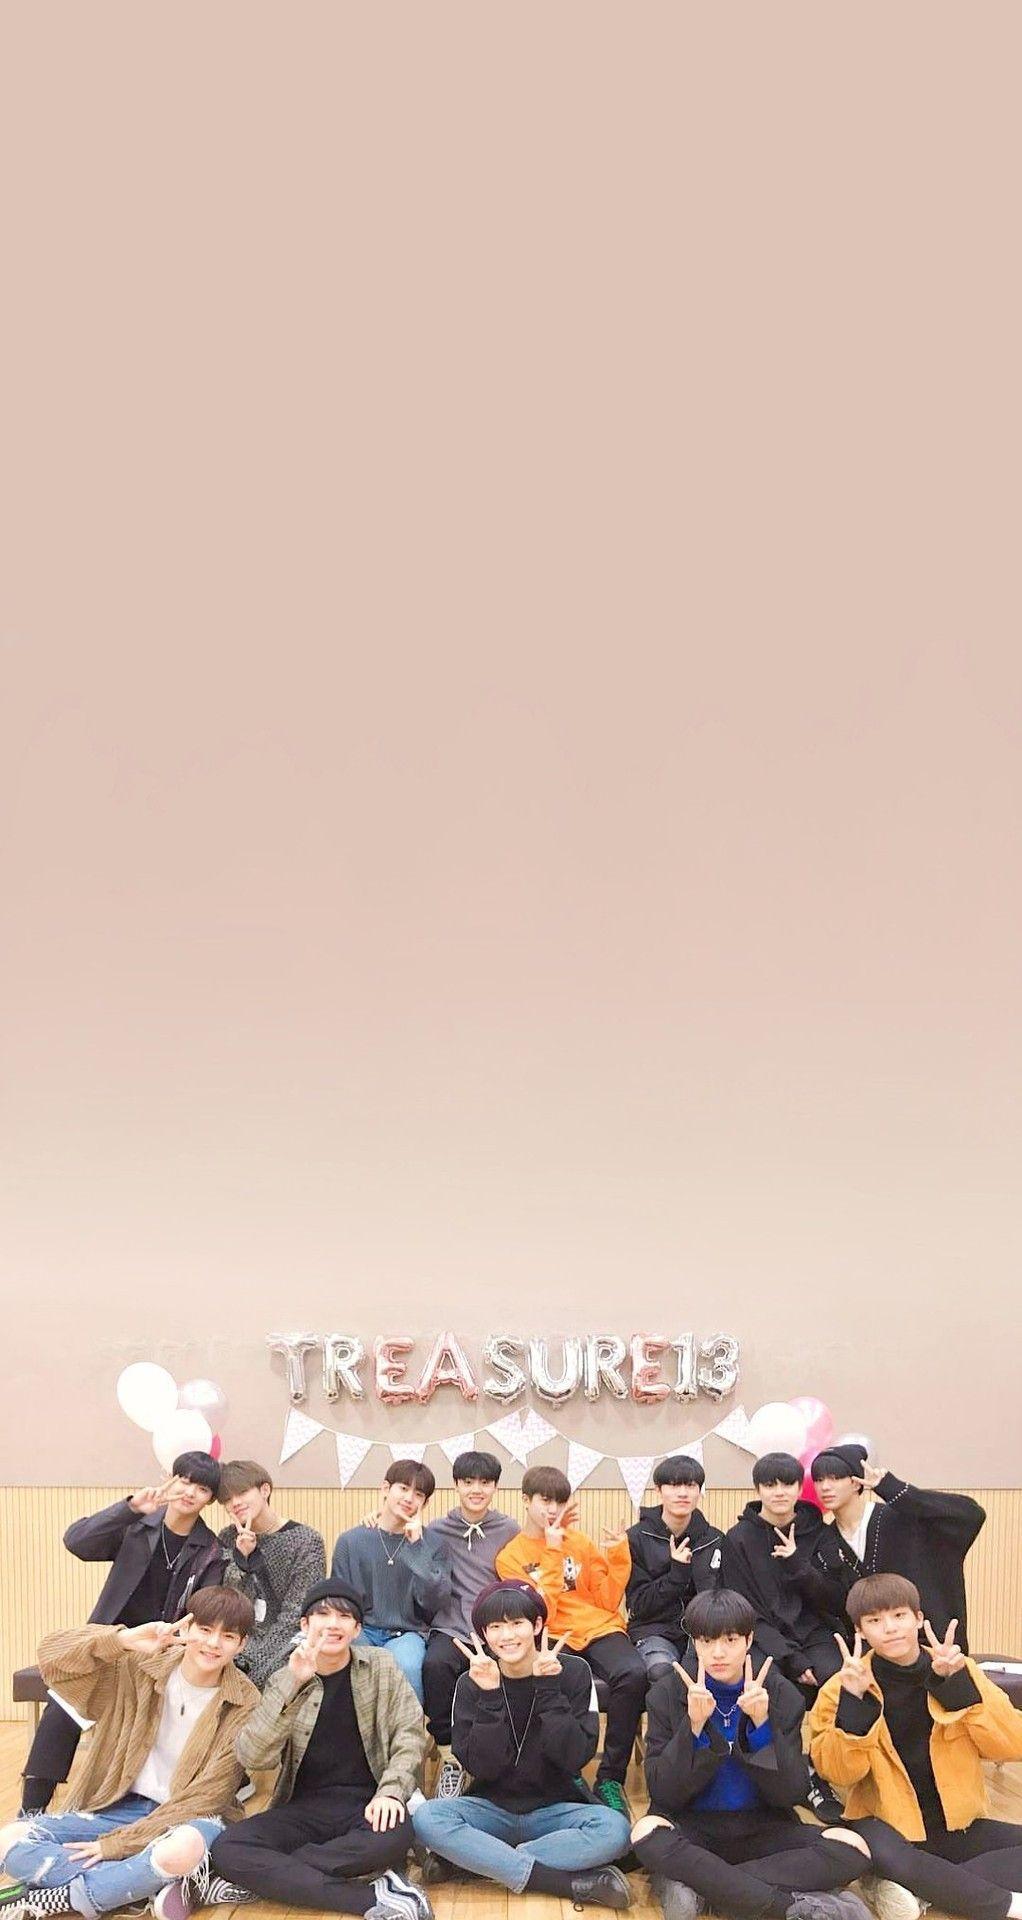 Treasure 13 Wallpapers Top Free Treasure 13 Backgrounds Wallpaperaccess